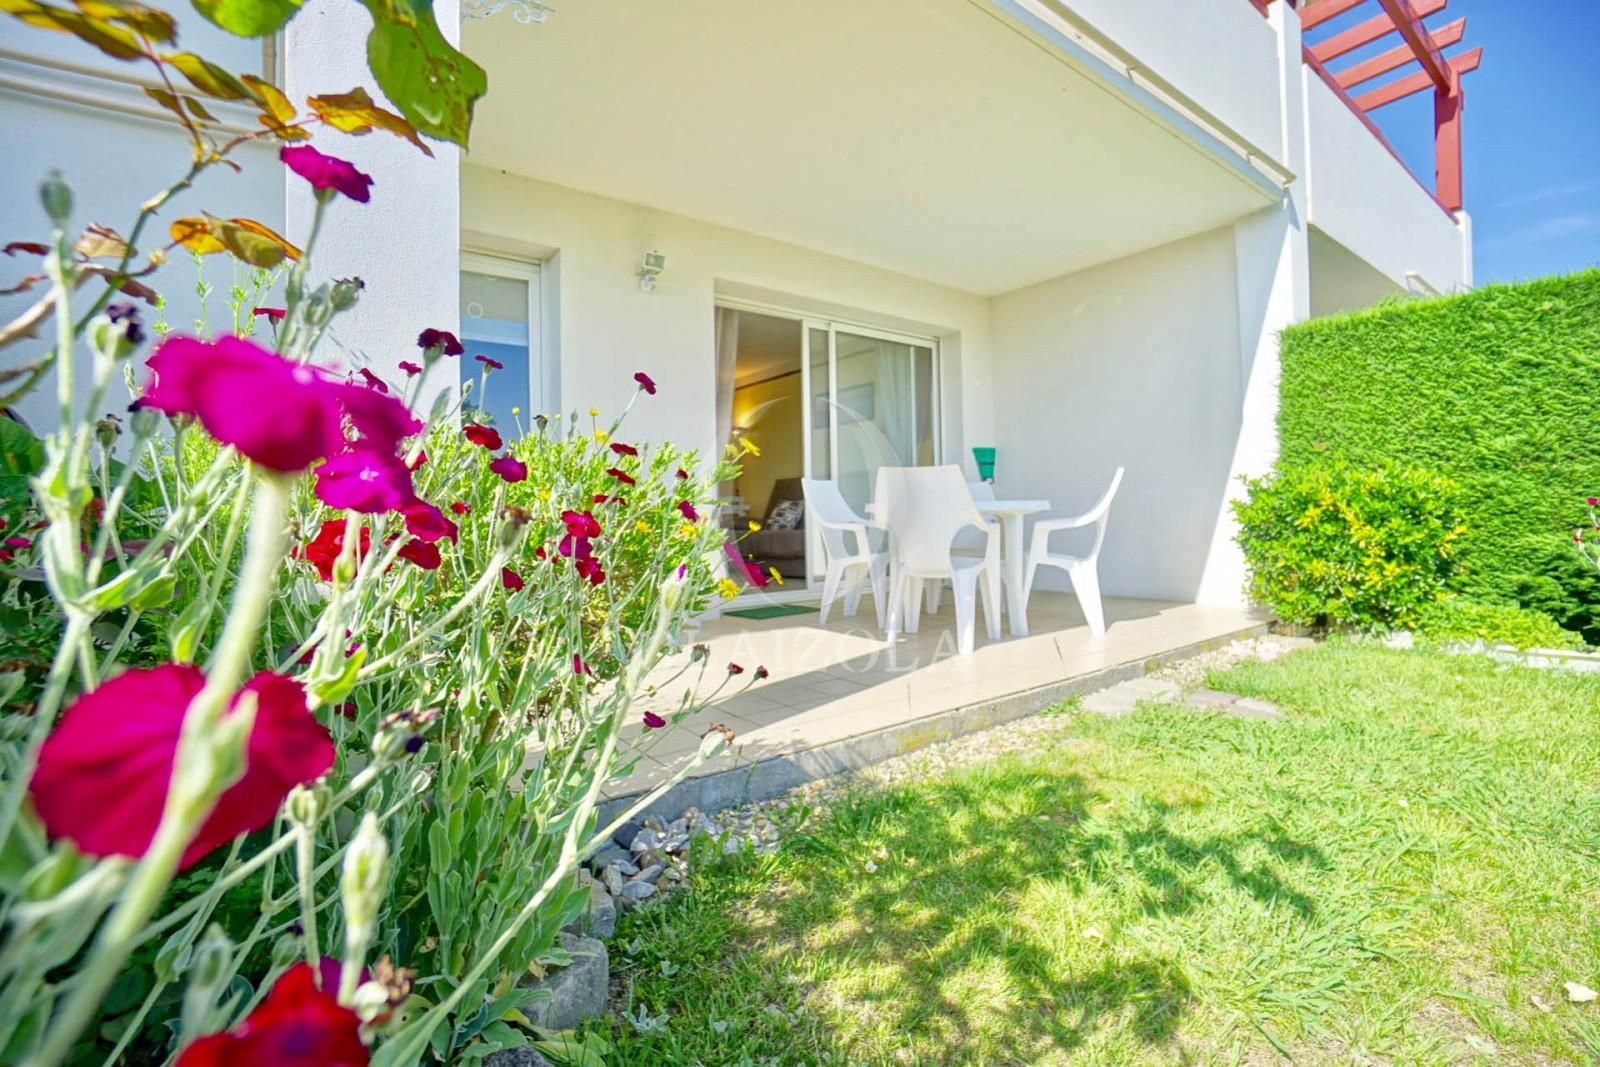 Jardin Sur Une Terrasse grand jardin et terrasse plein sud | agence olaizola